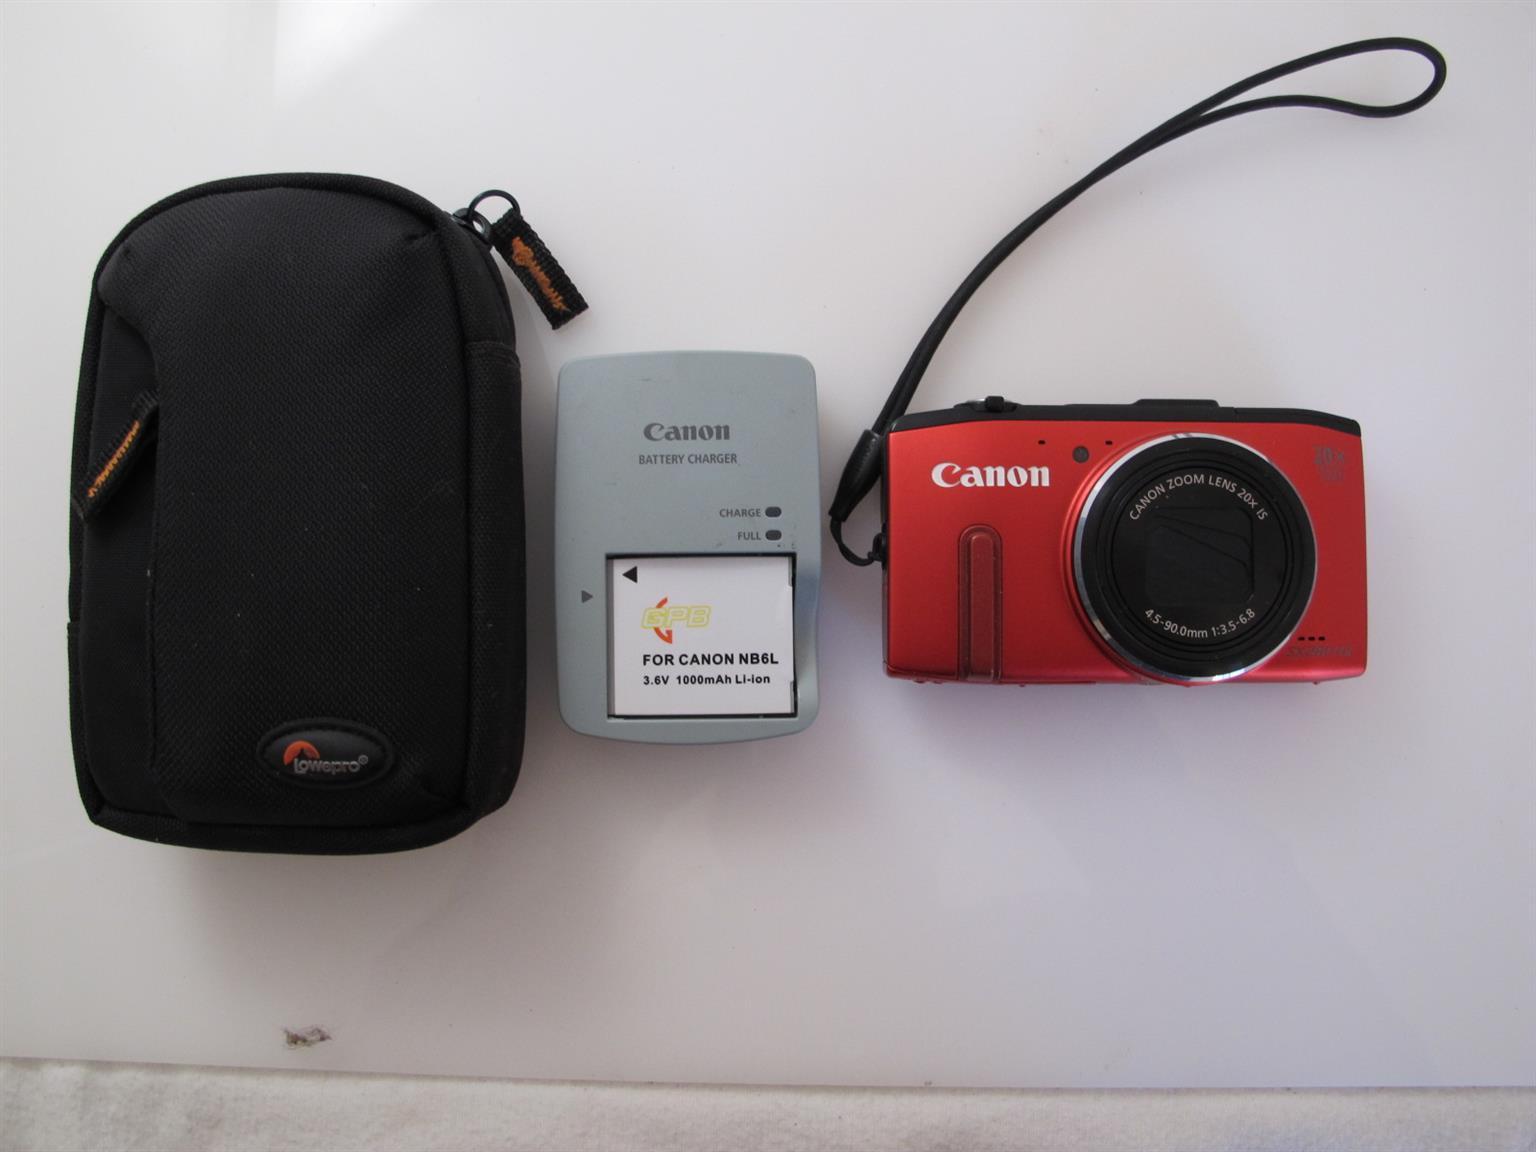 The Canon SX280 HS compact camera